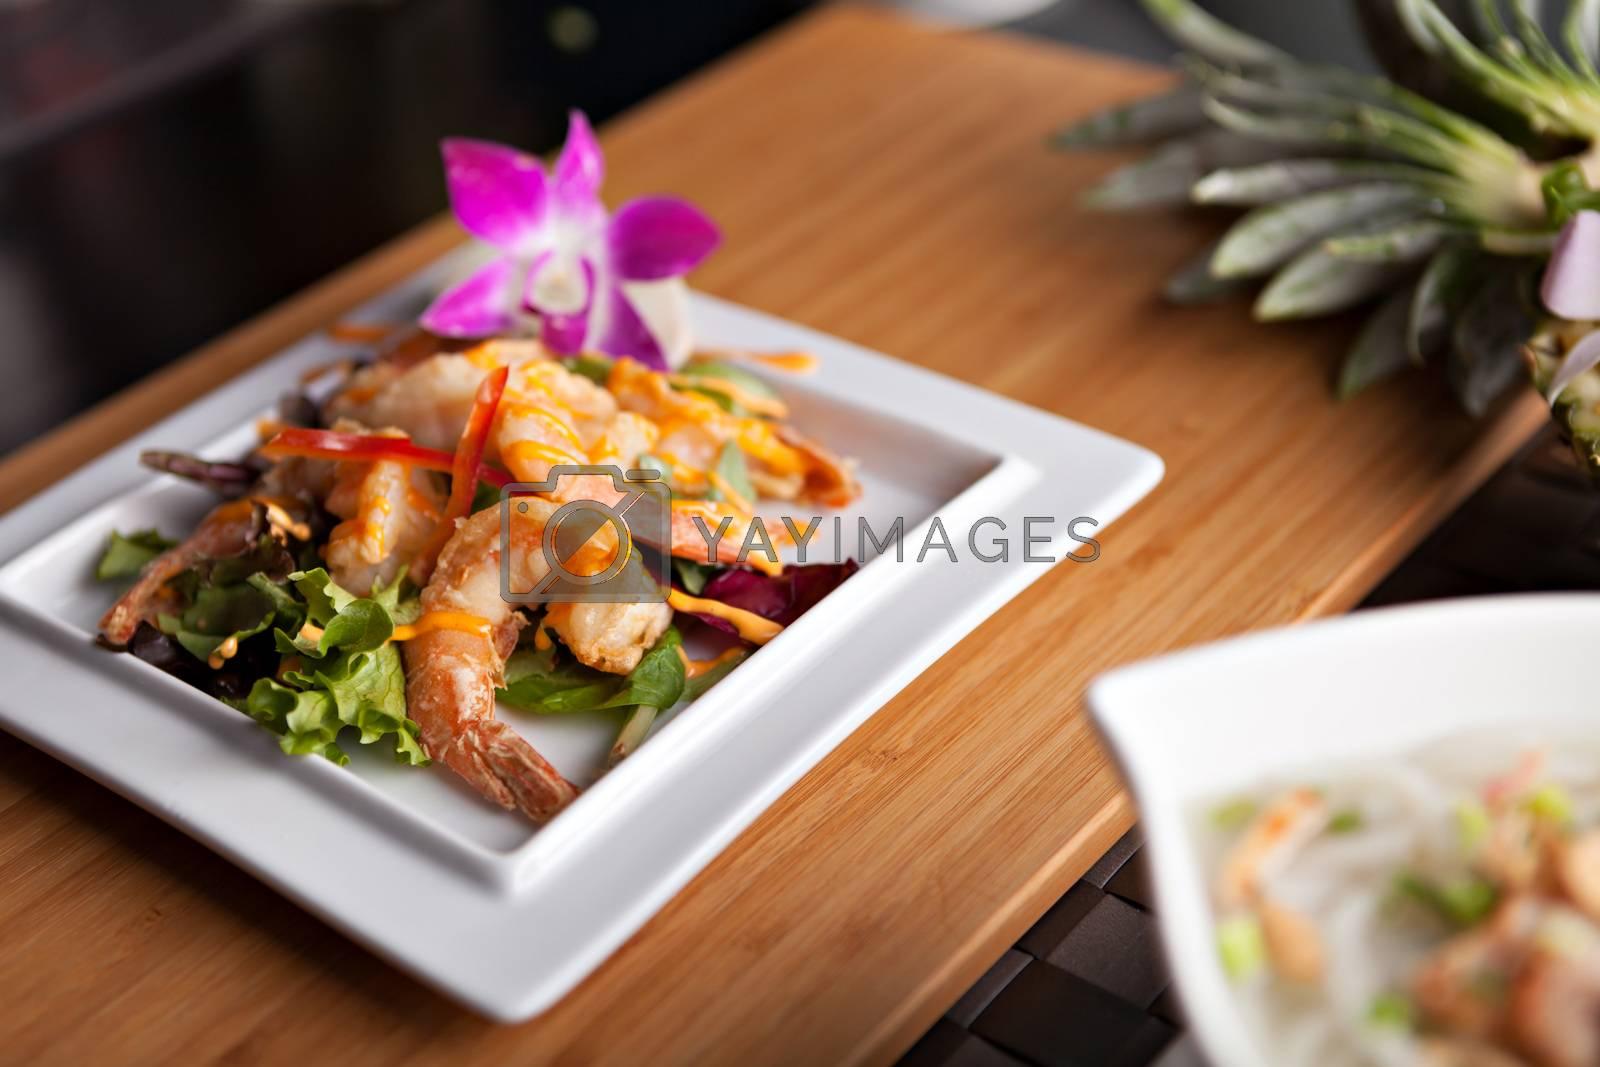 Royalty free image of Thai Shrimp Dish by graficallyminded